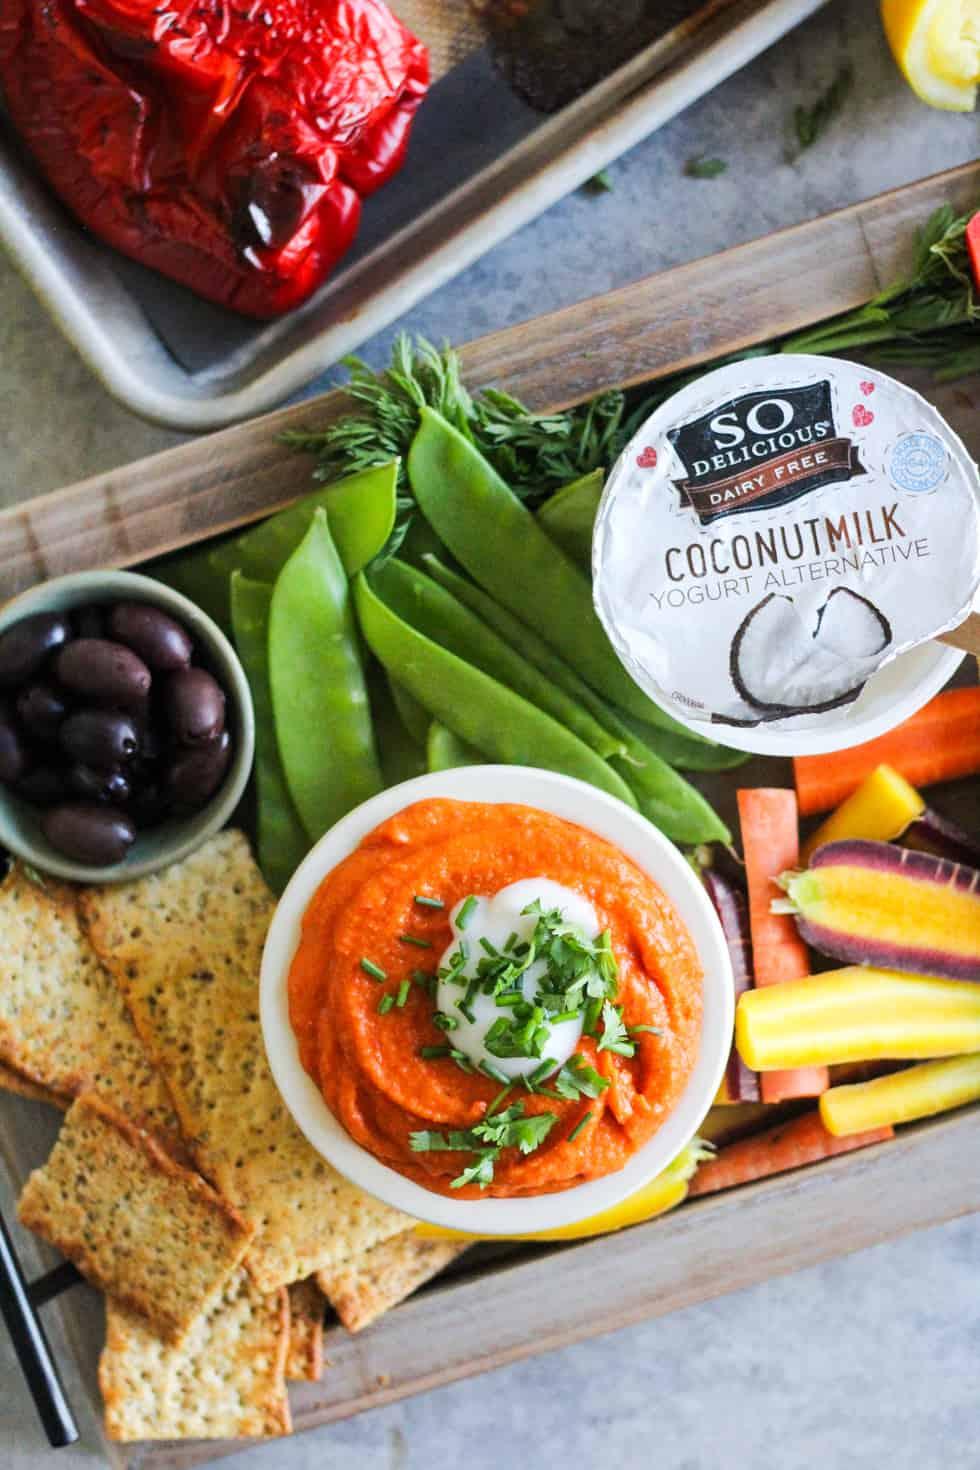 Snack board with So Delicious yogurt alternative and orange dip.